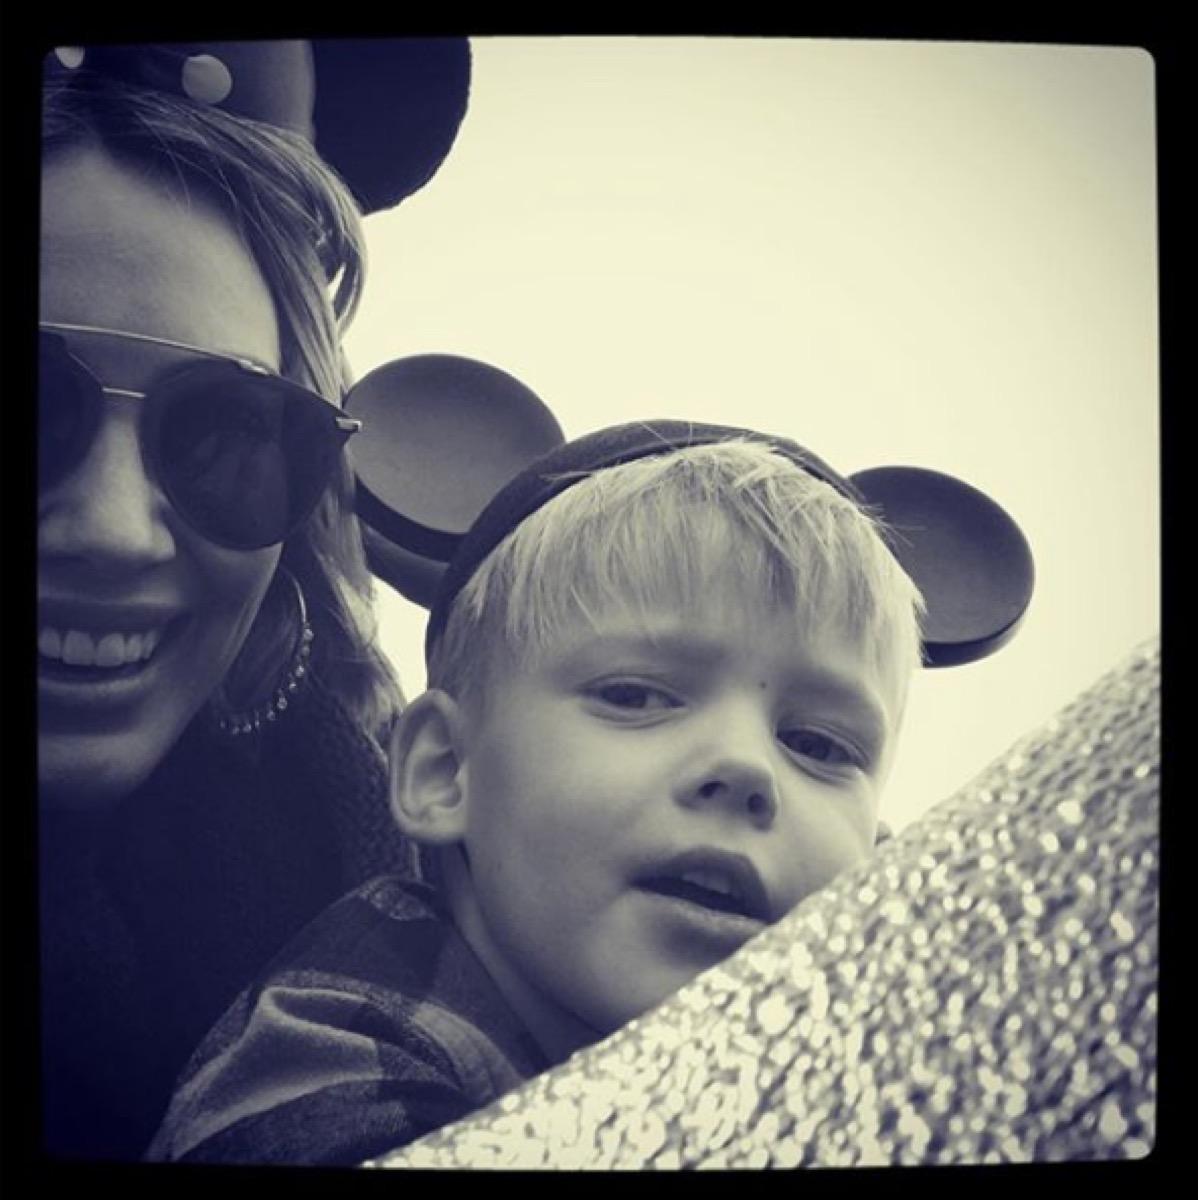 hilary duff at disneyland with son wearing mickey ears, disney celebs